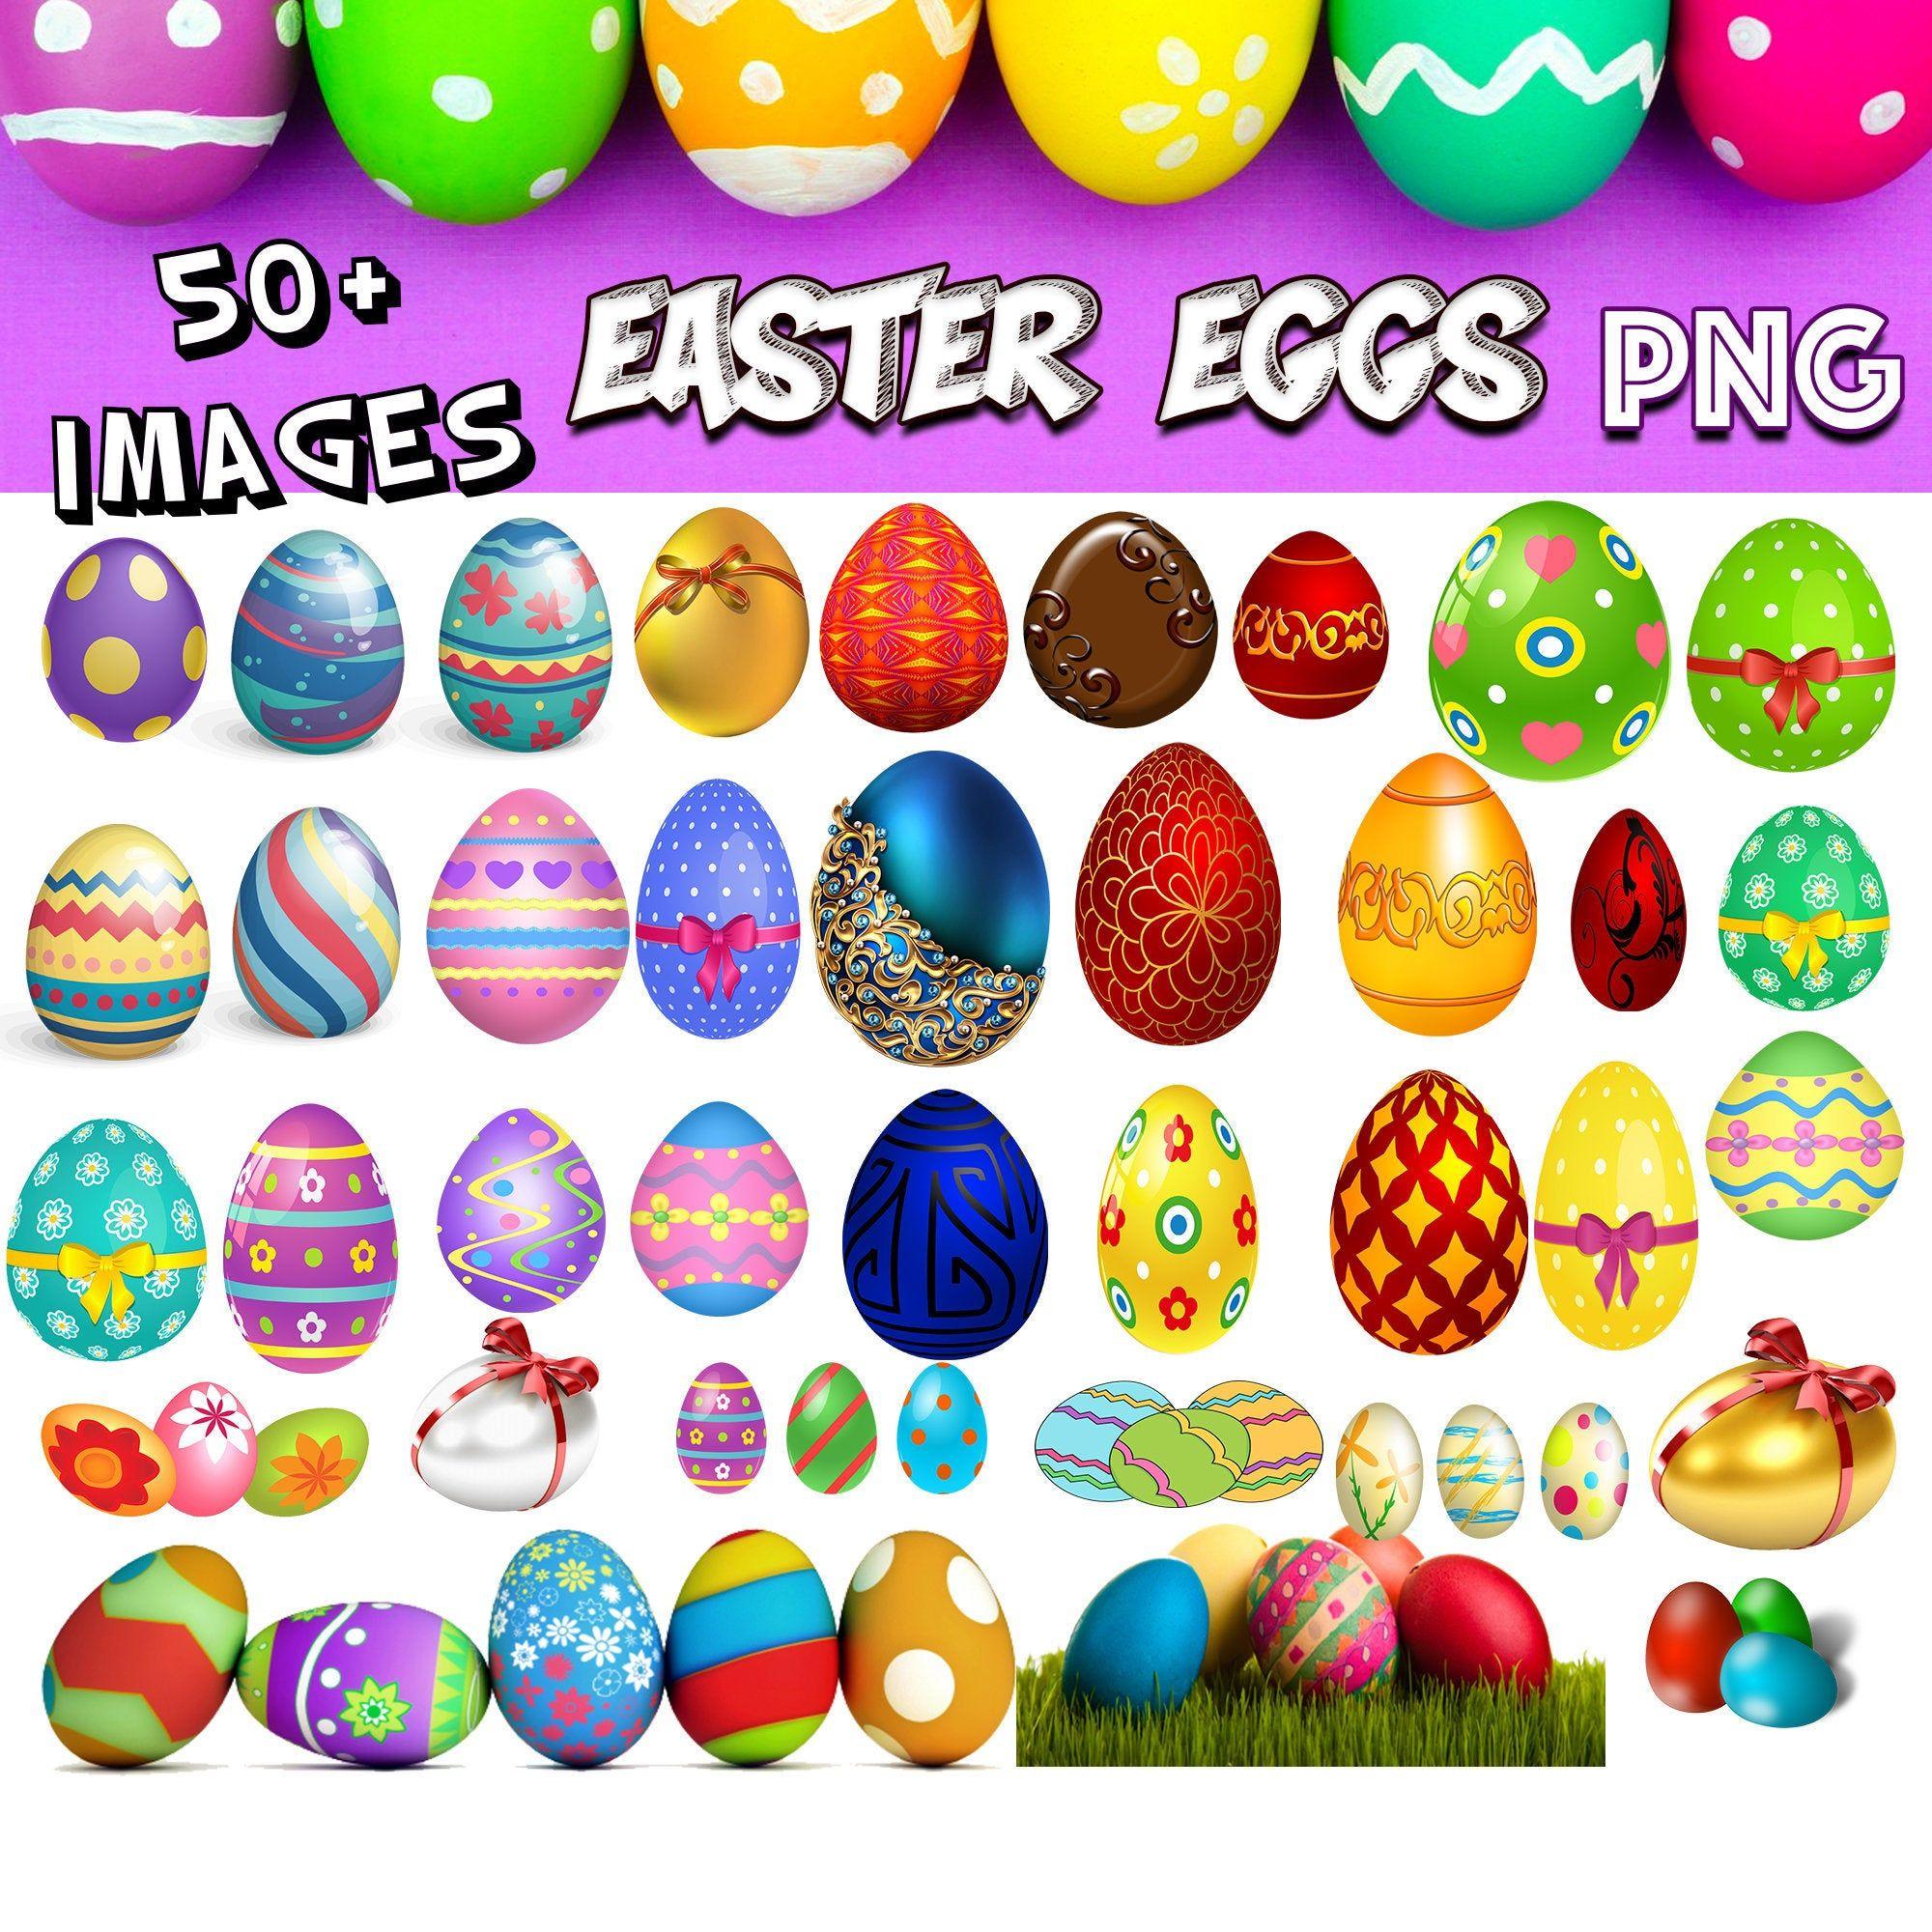 Easter Egg Transparent Background Set Png Clipart Digital Download Holidays Decorate Designs By Aliasnomdeplume On Etsy Clip Art Easter Eggs Etsy